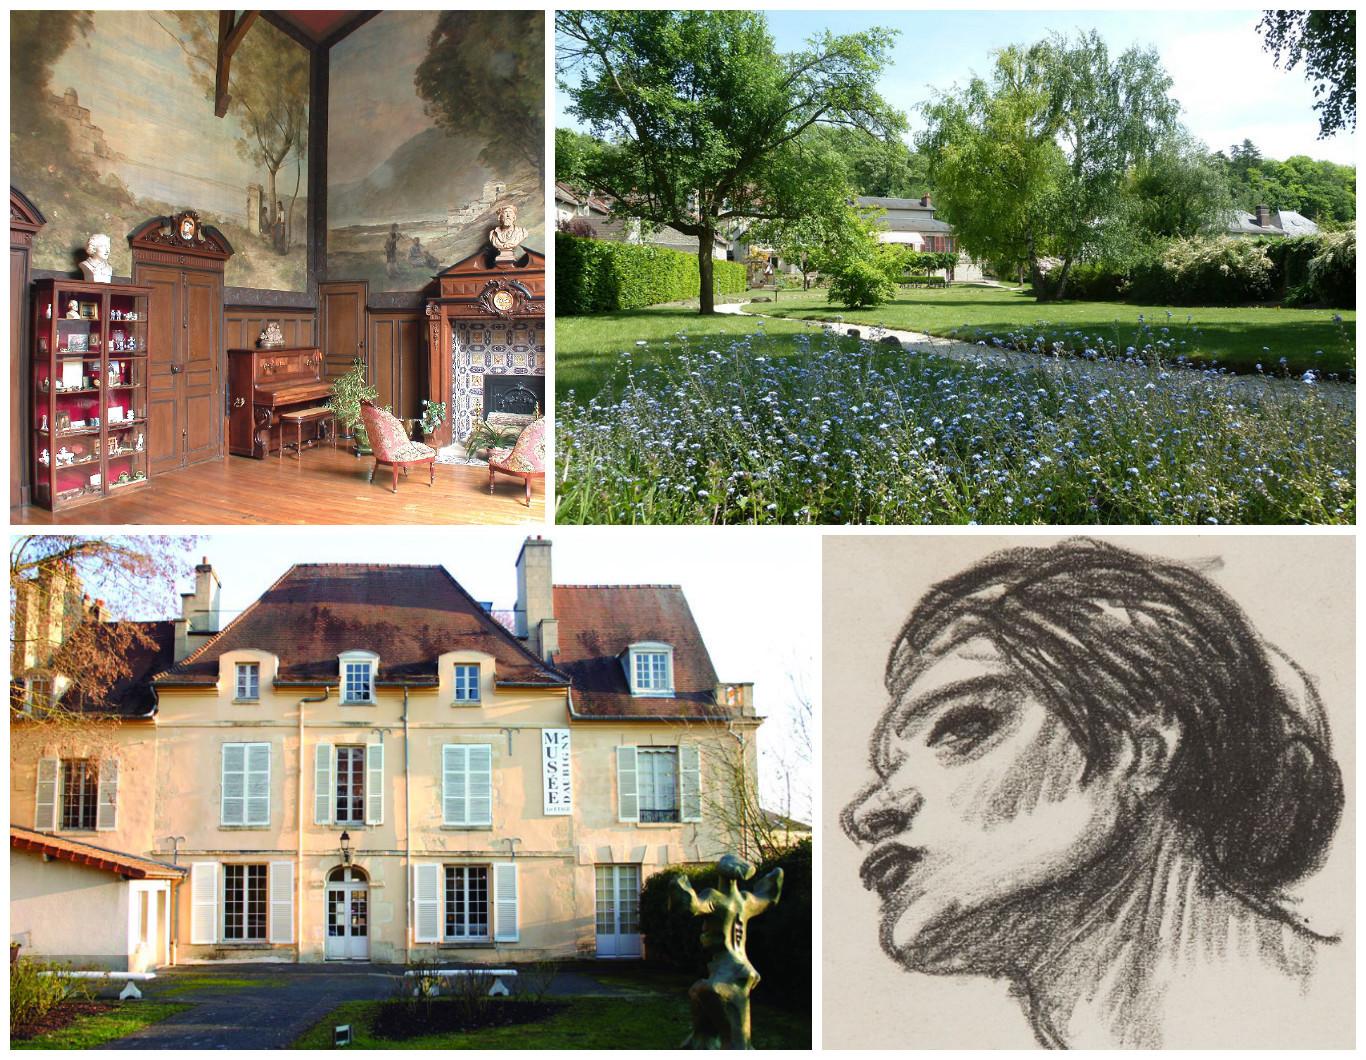 Discover van Gogh's contemporaries at the Daubigny museum and studio